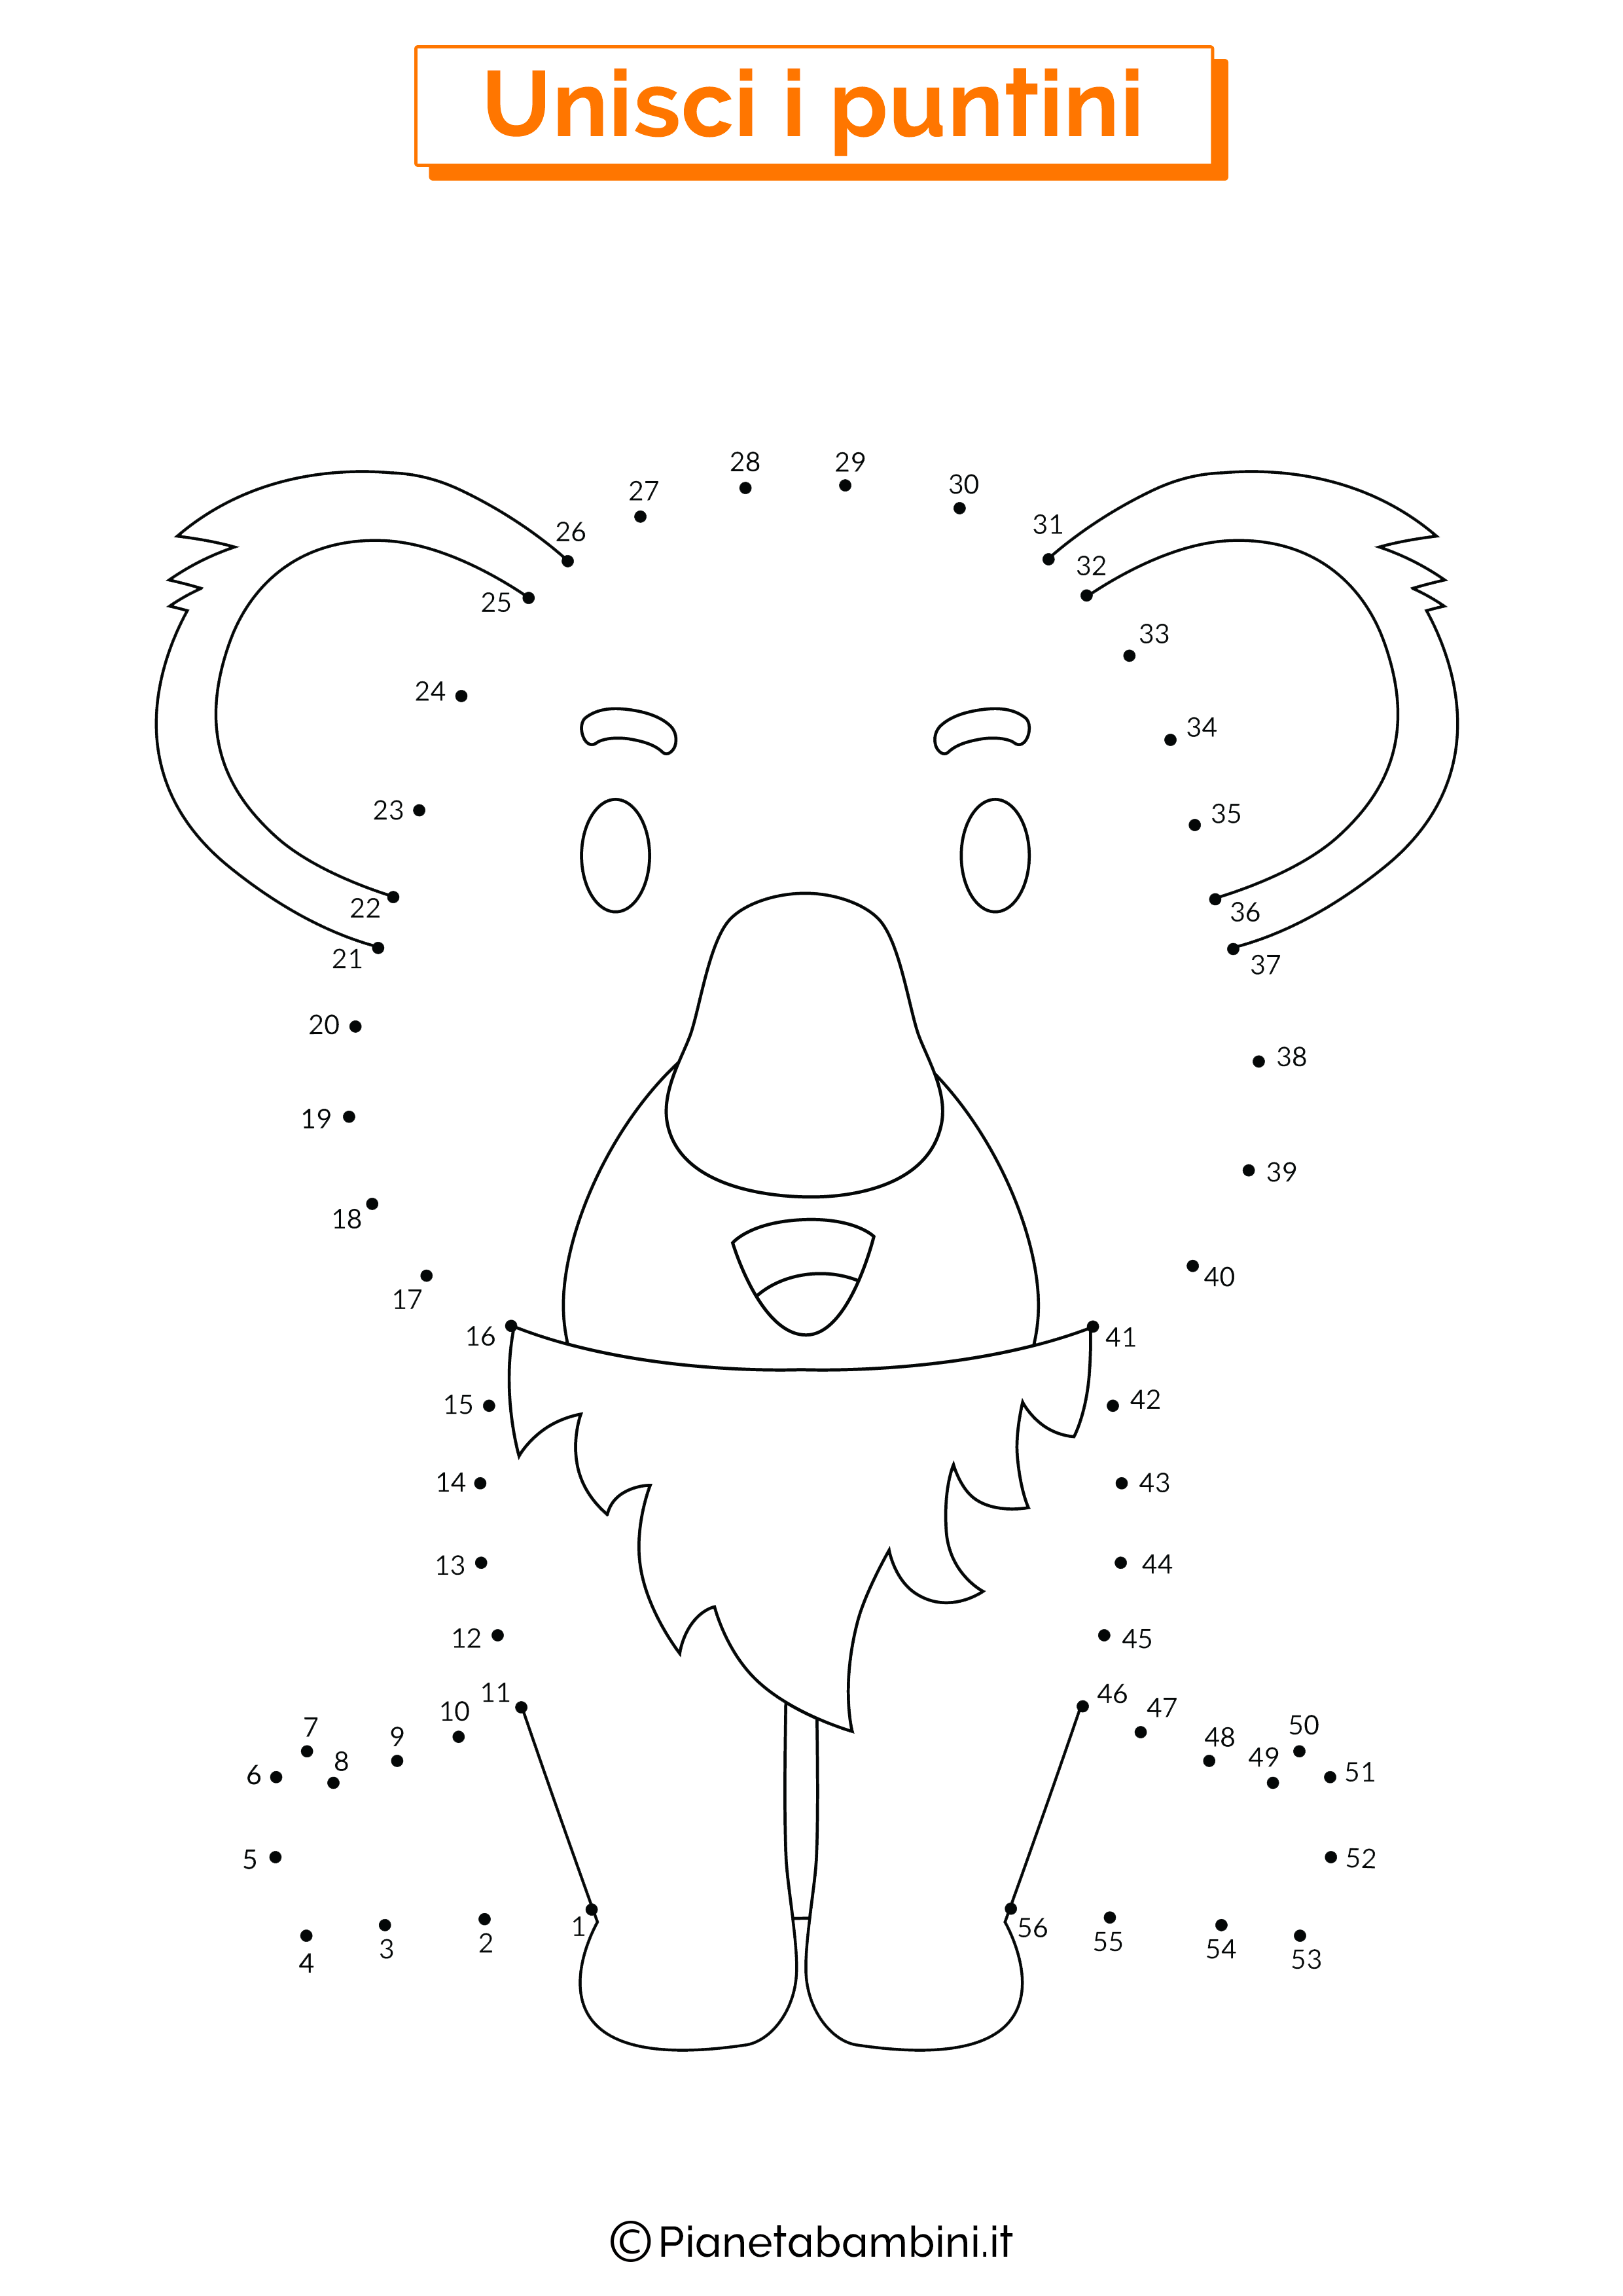 Disegno unisci i puntini da 1 a 50 koala